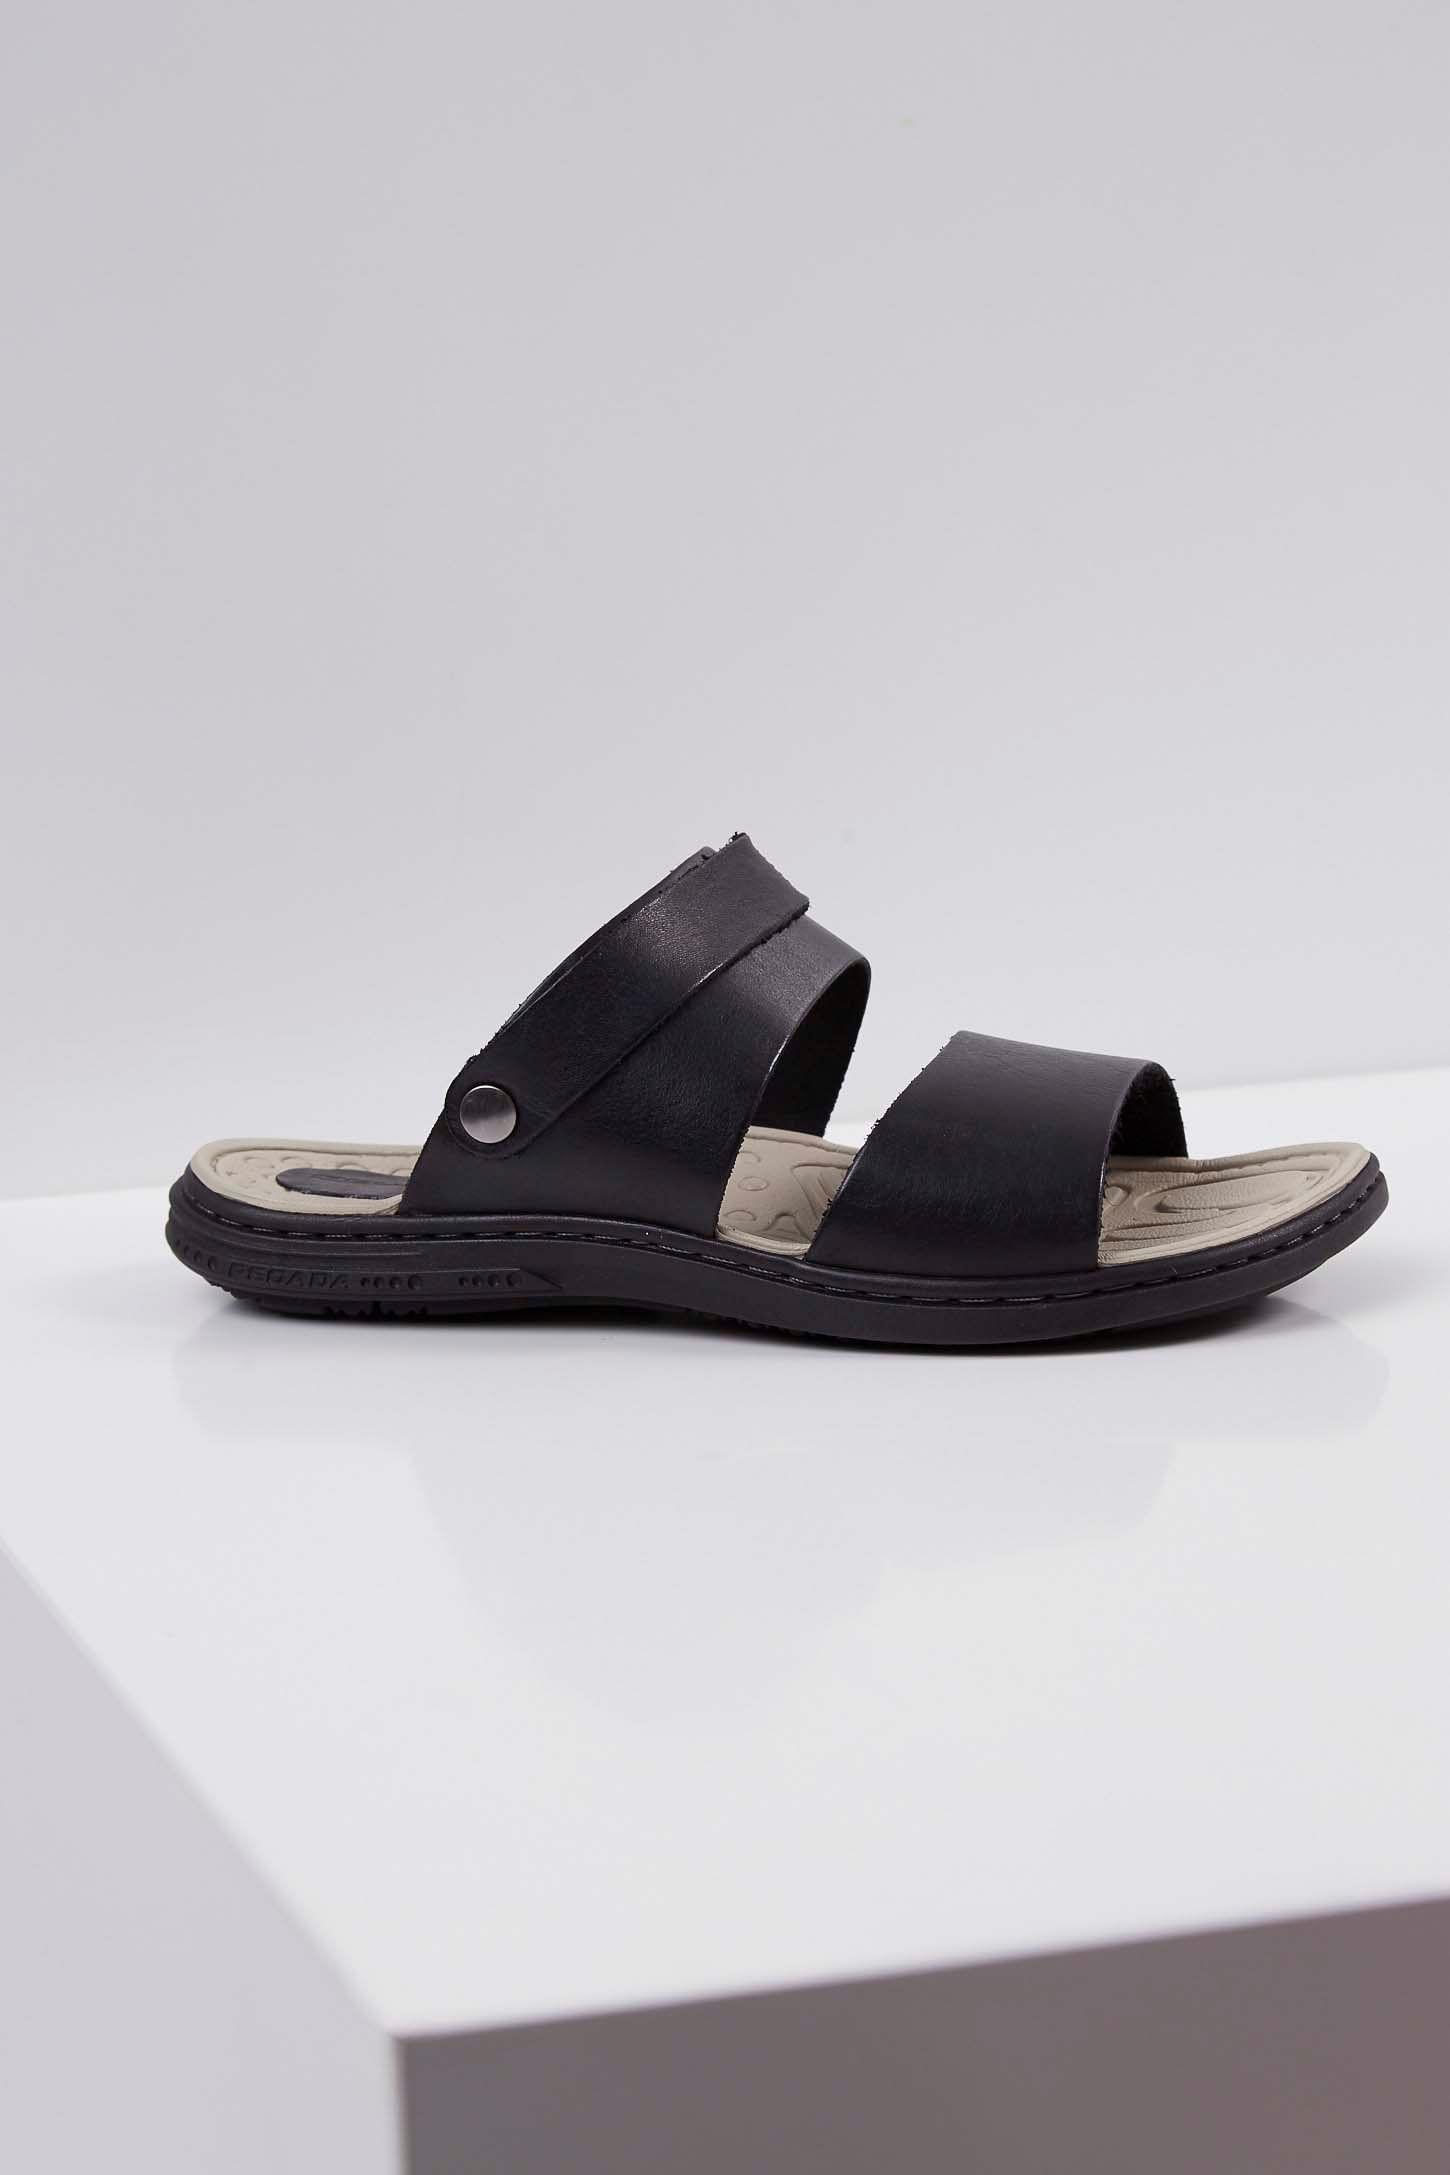 Sandalia-Chinelo-Masculino-Tradicional-Pegada-Preto-